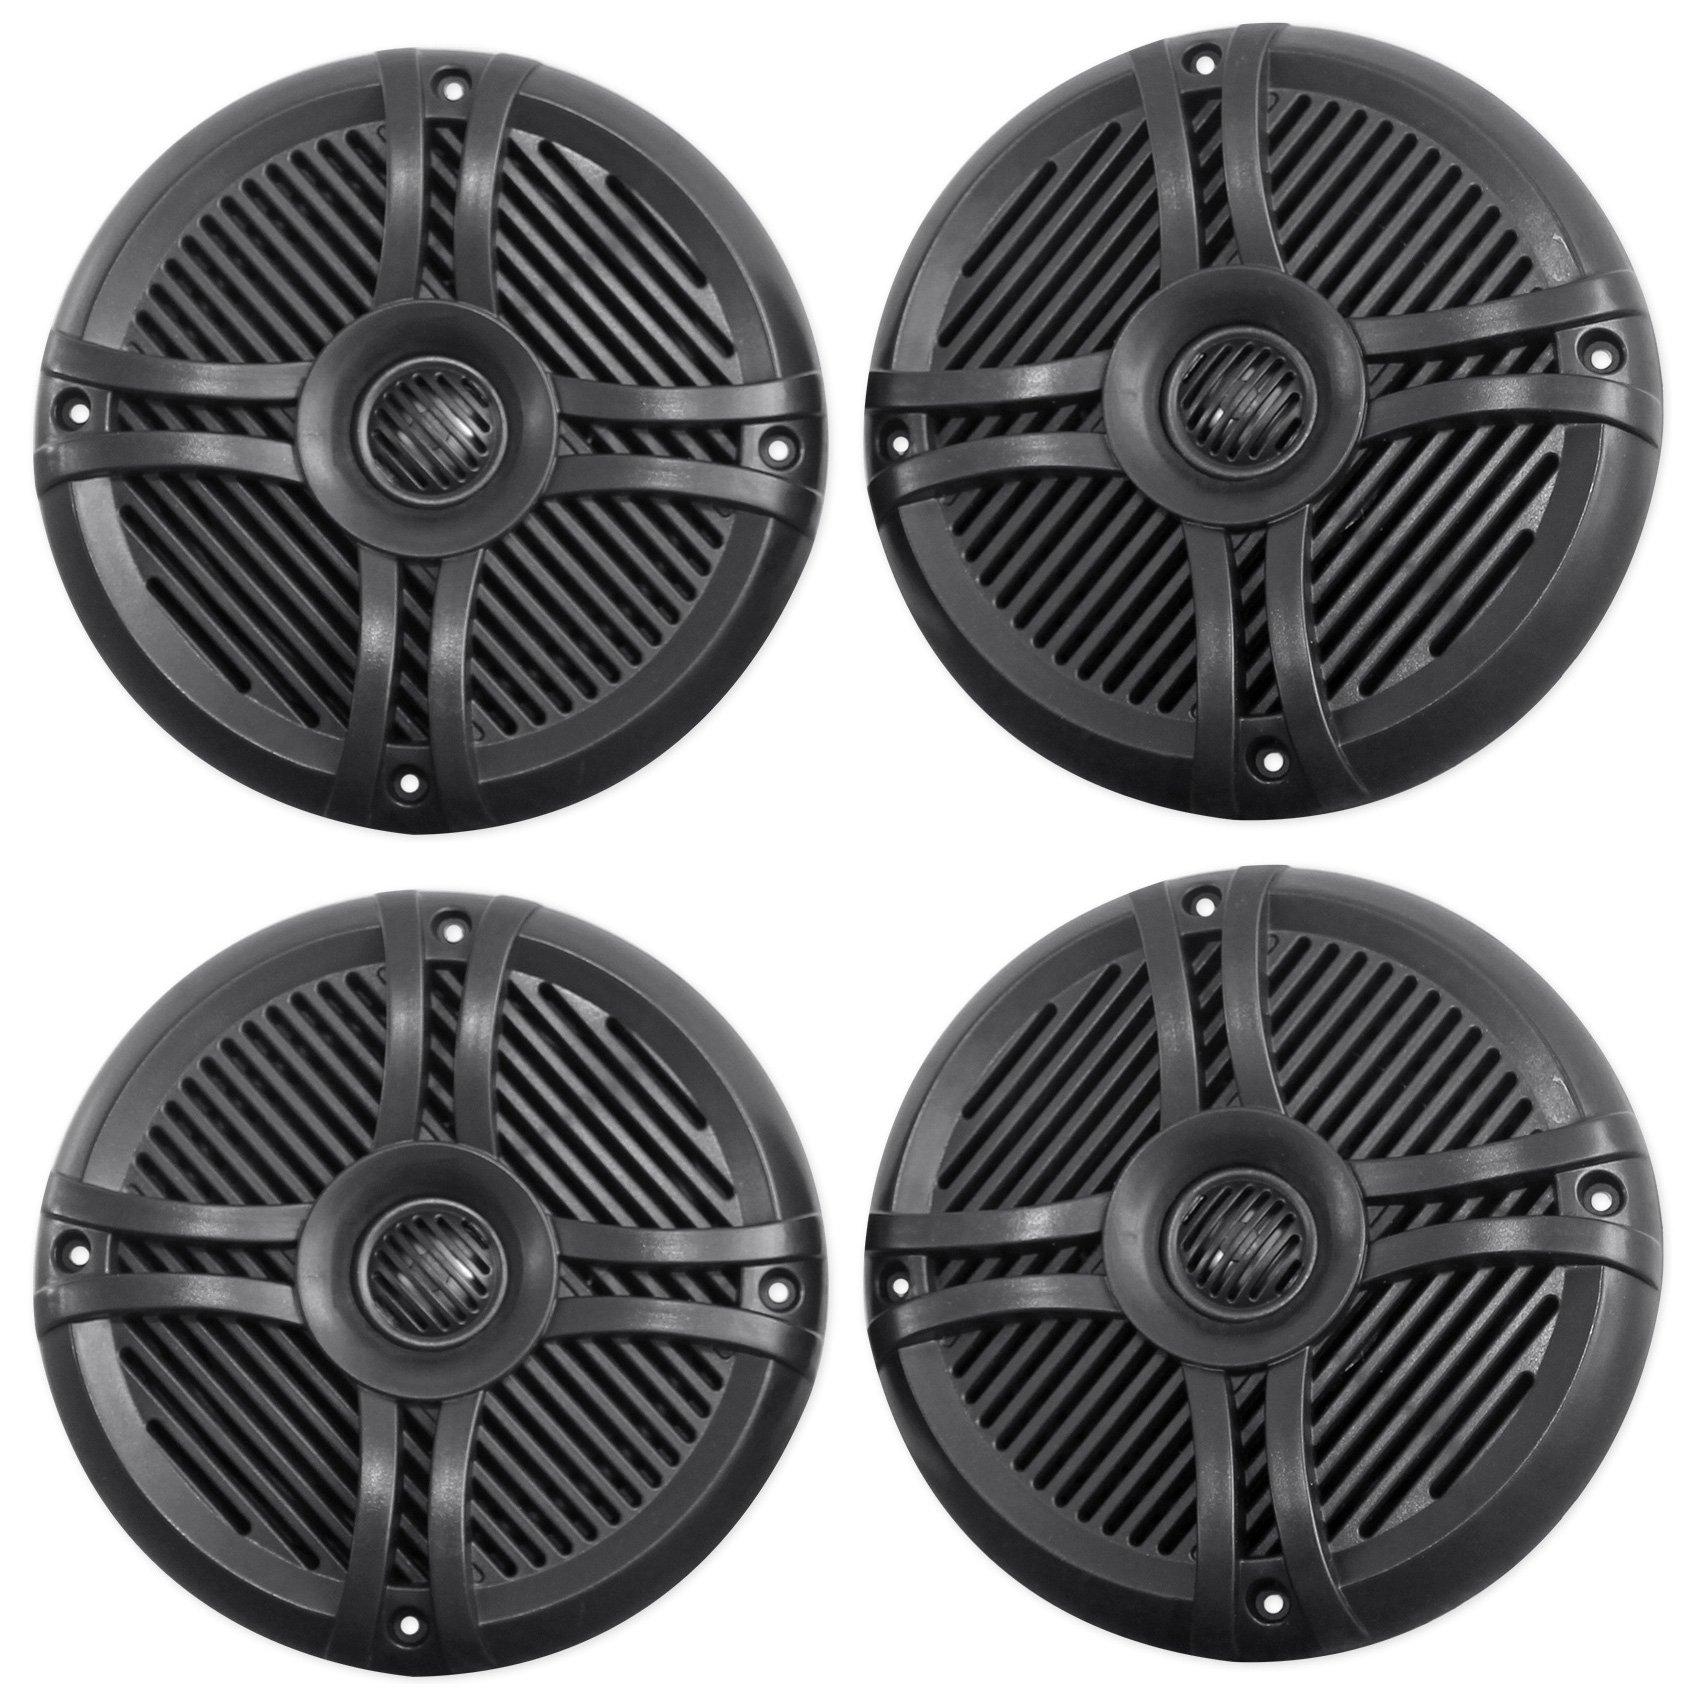 (4) Rockville RMSTS65B 6.5'' 1600w Waterproof Marine Boat Speakers 2-Way Black